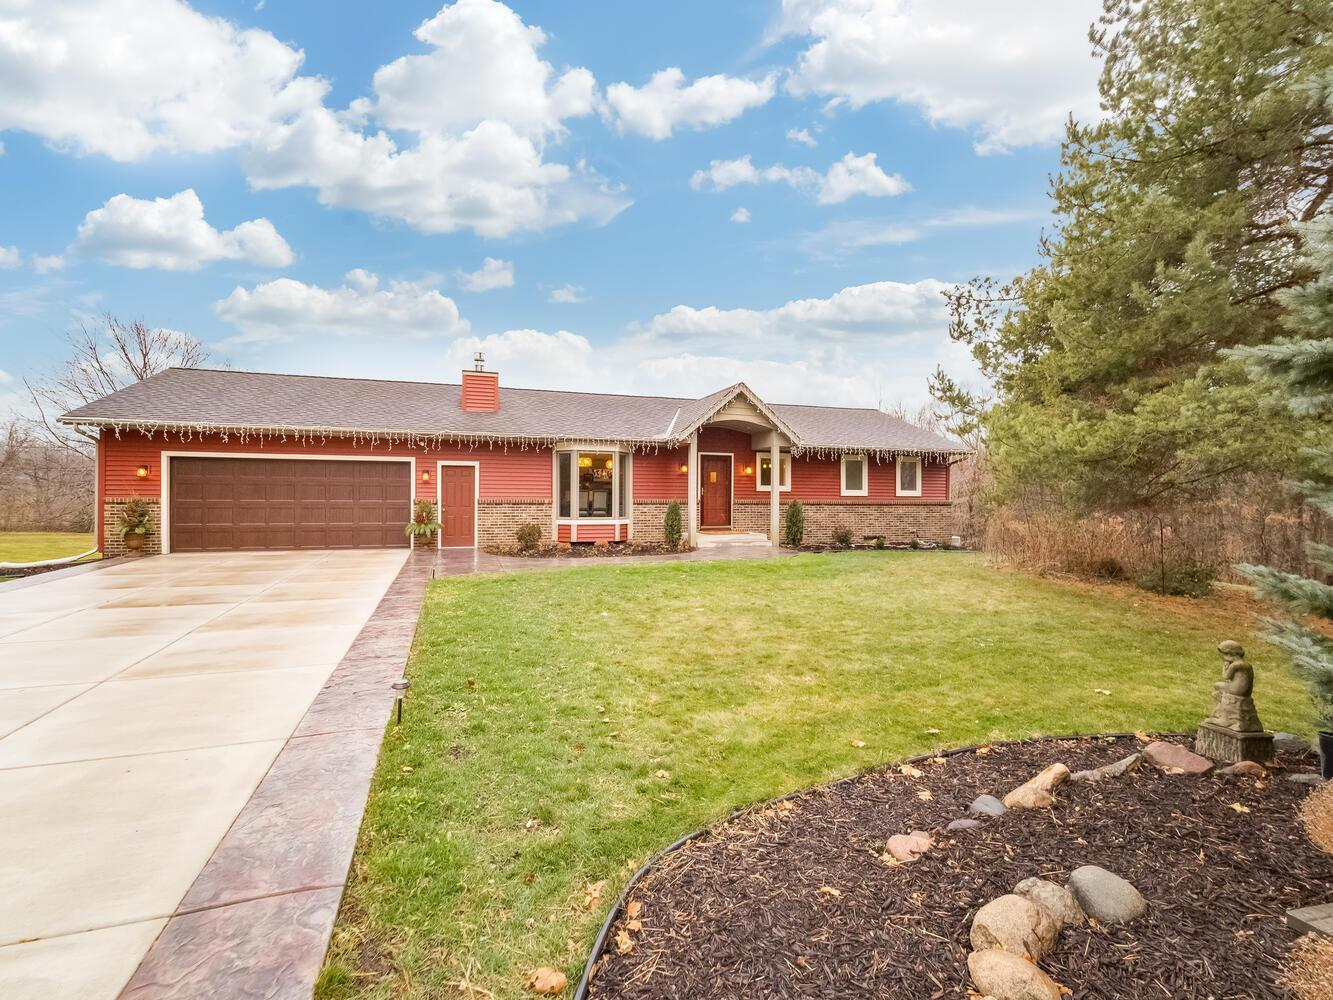 12675 Dodd Court Property Photo - Rosemount, MN real estate listing